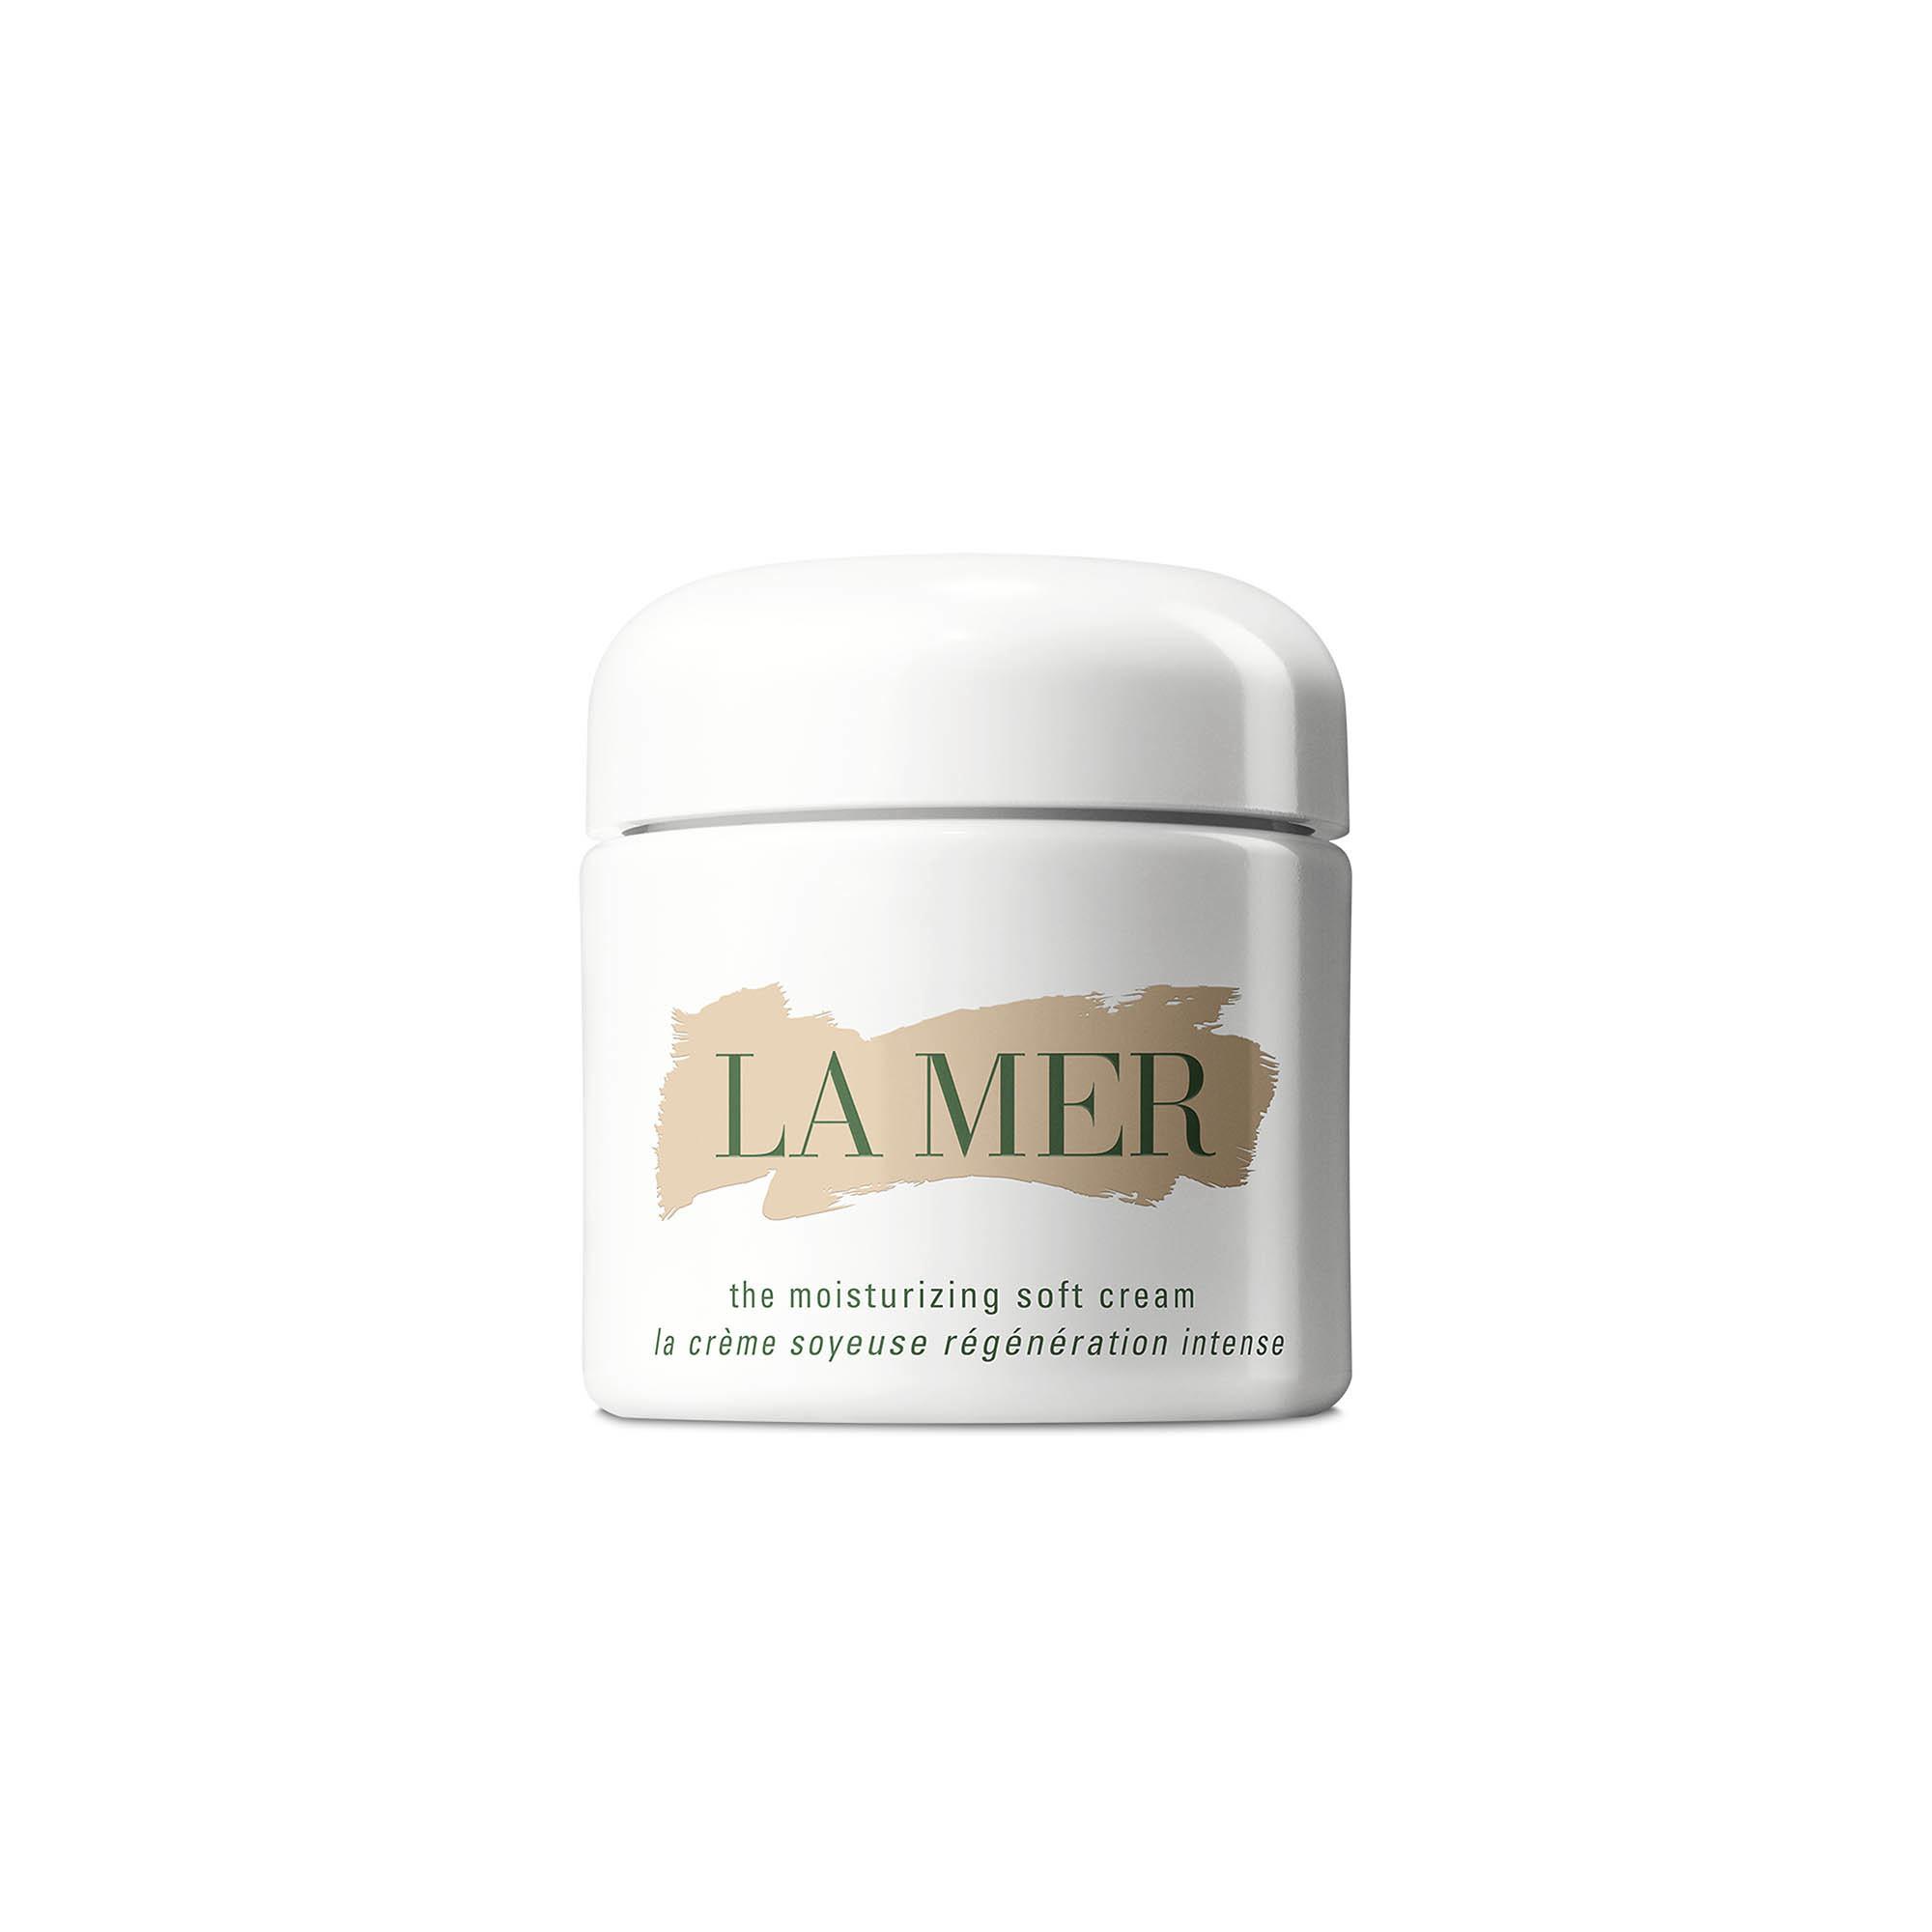 La Mer The Moisturizing Soft Cream, 100 ml